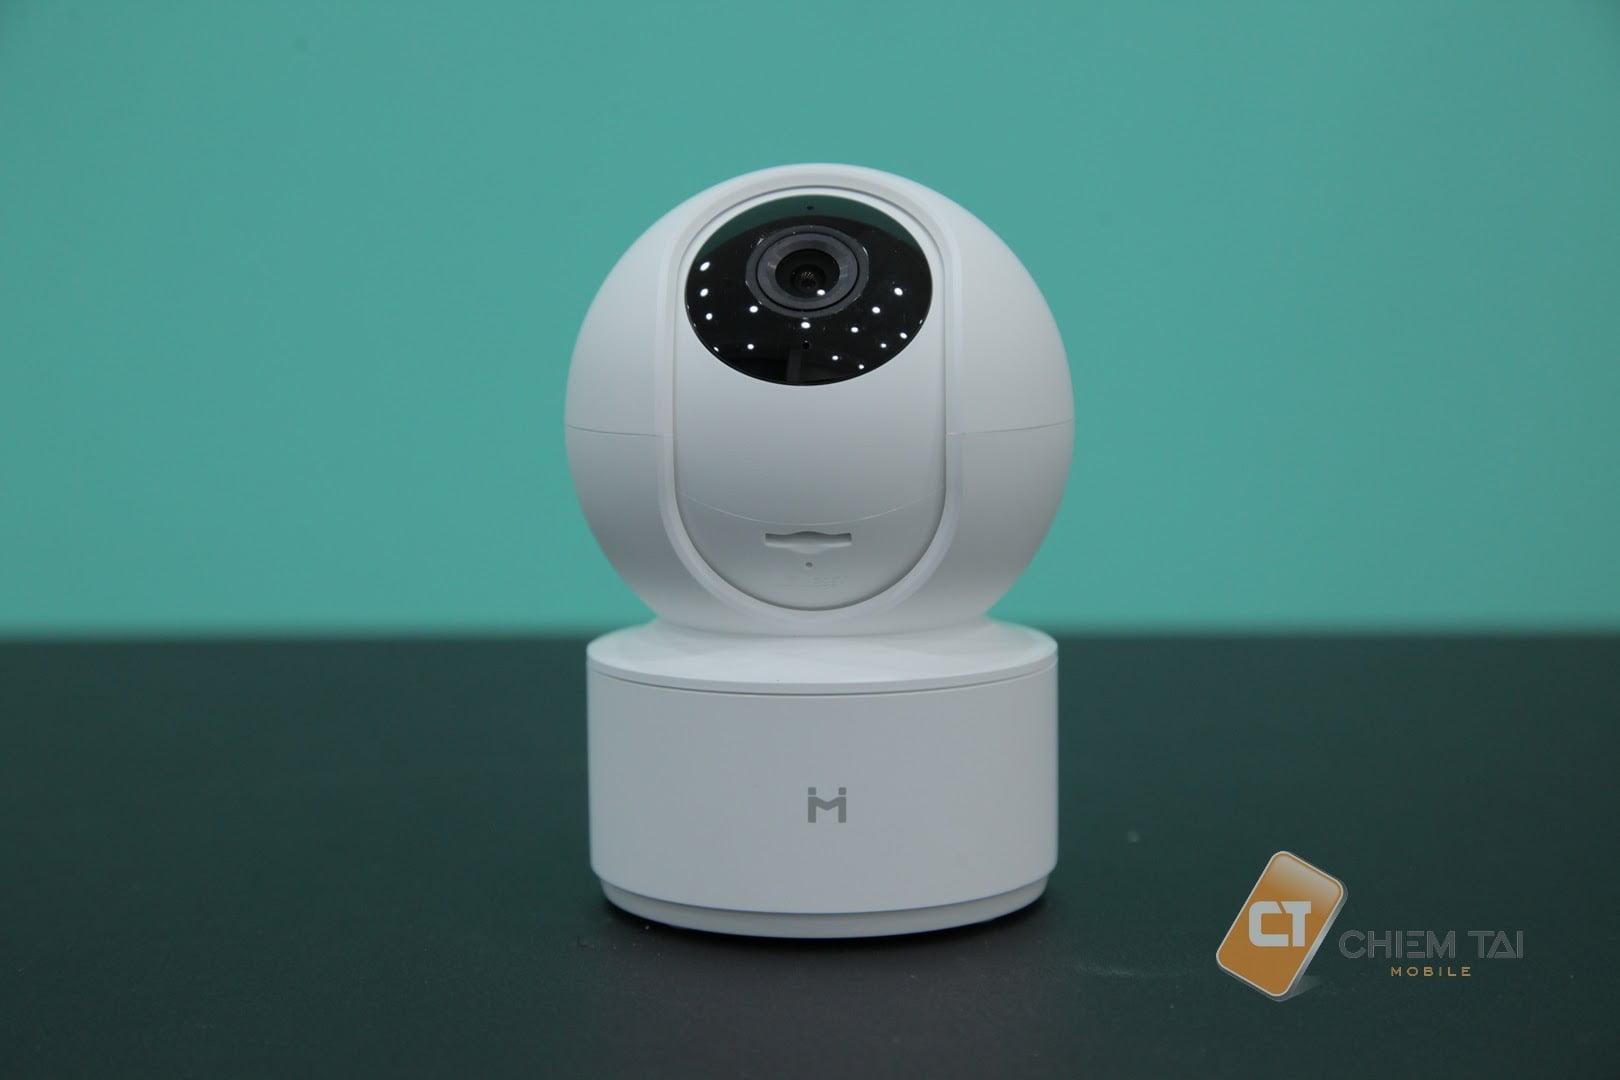 camera ip imilab home security ptz 1080p 6007d2c3dc5f2